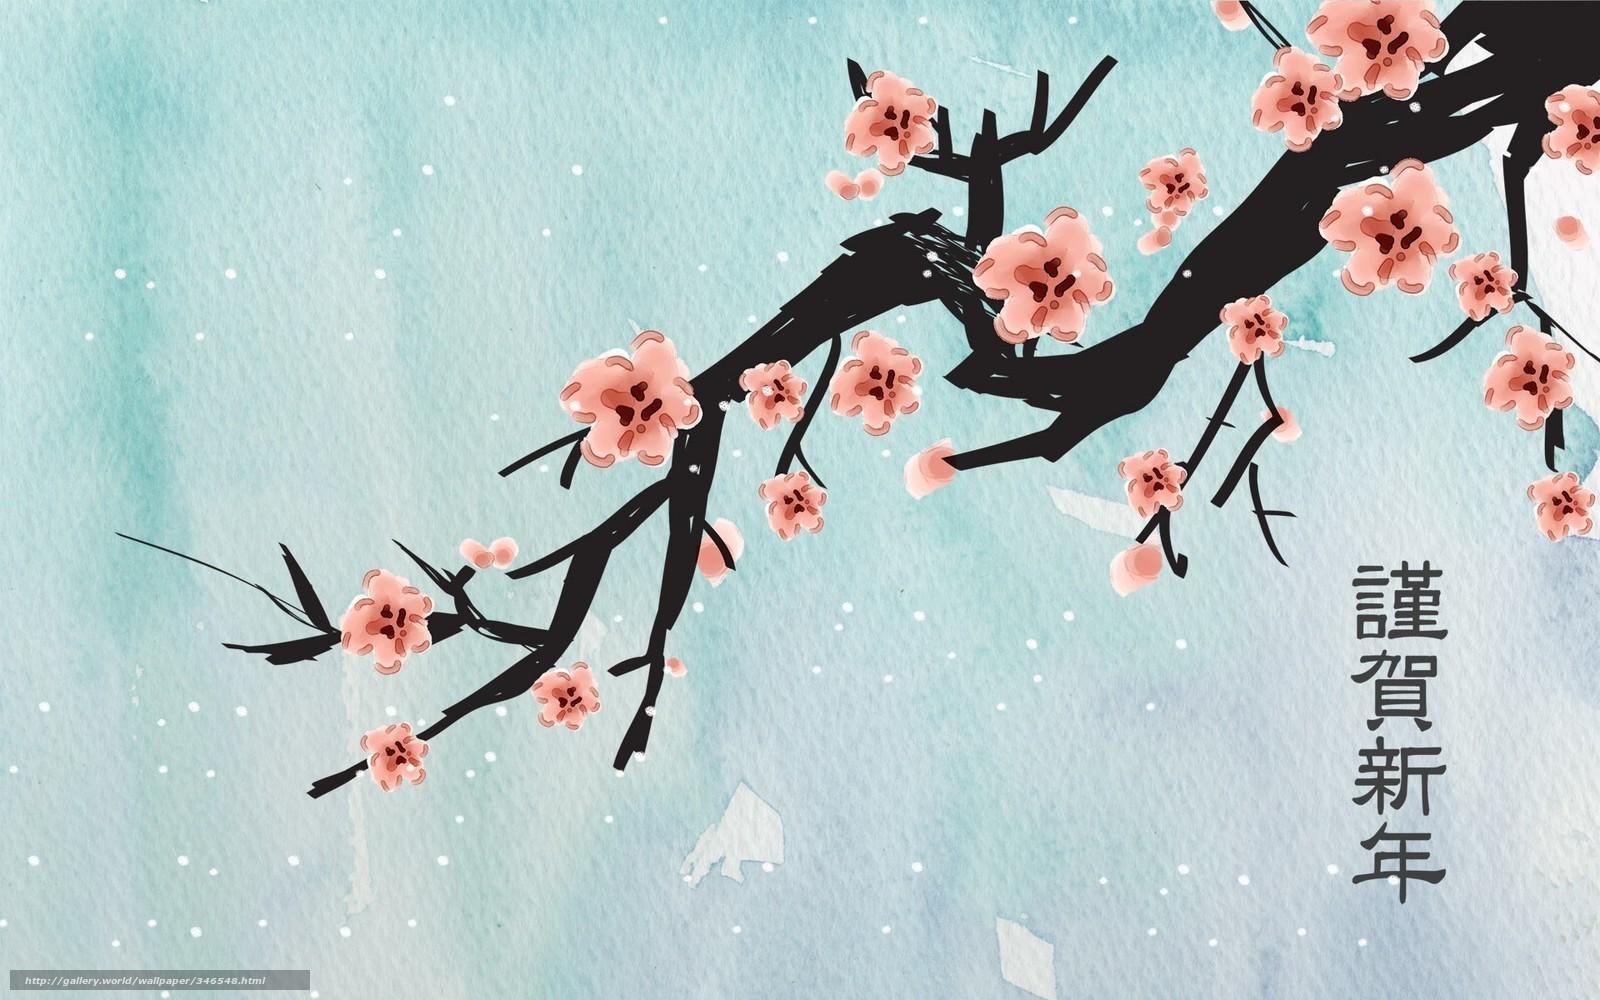 Tlcharger Fond D Ecran Dessin Sakura Branche Fleurs